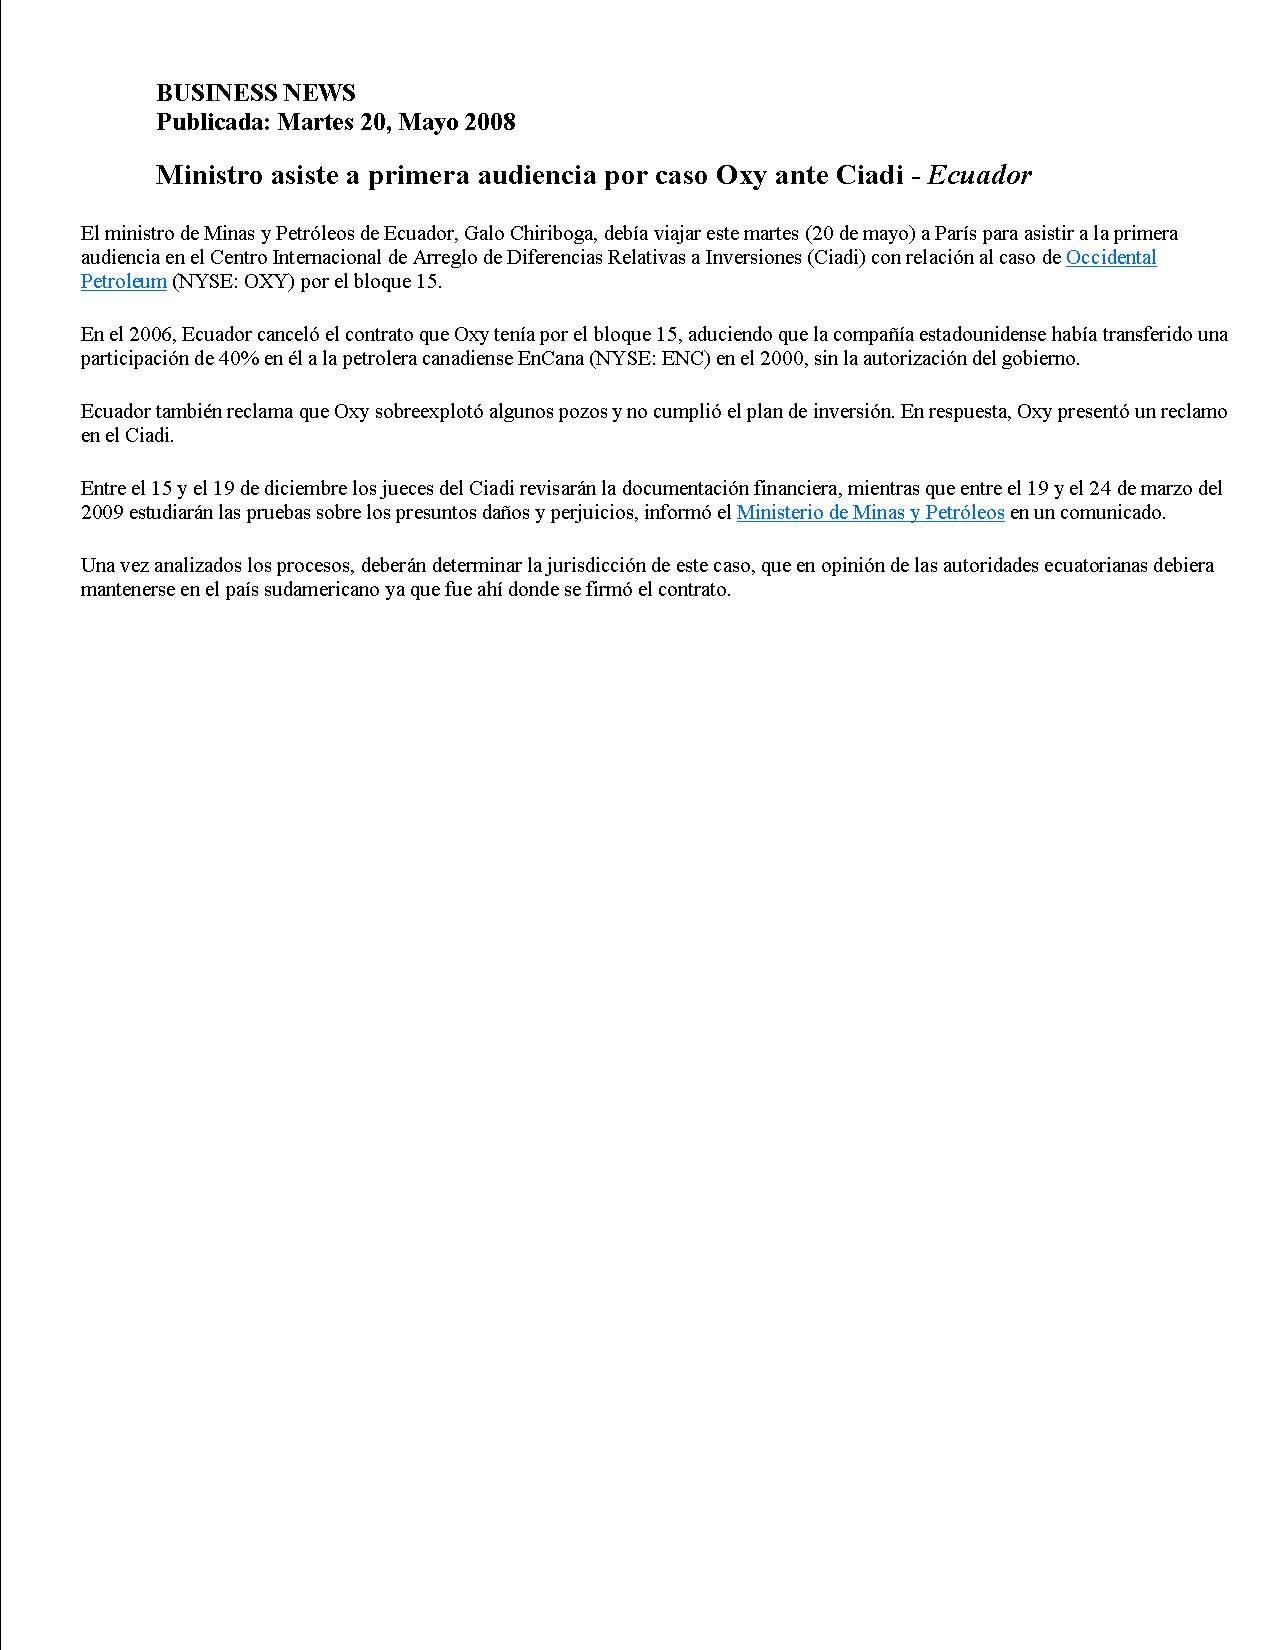 1-BUSINESS NEWS 20-05-2008-Ministro asiste a primera audiencia por caso Oxy ante Ciadi